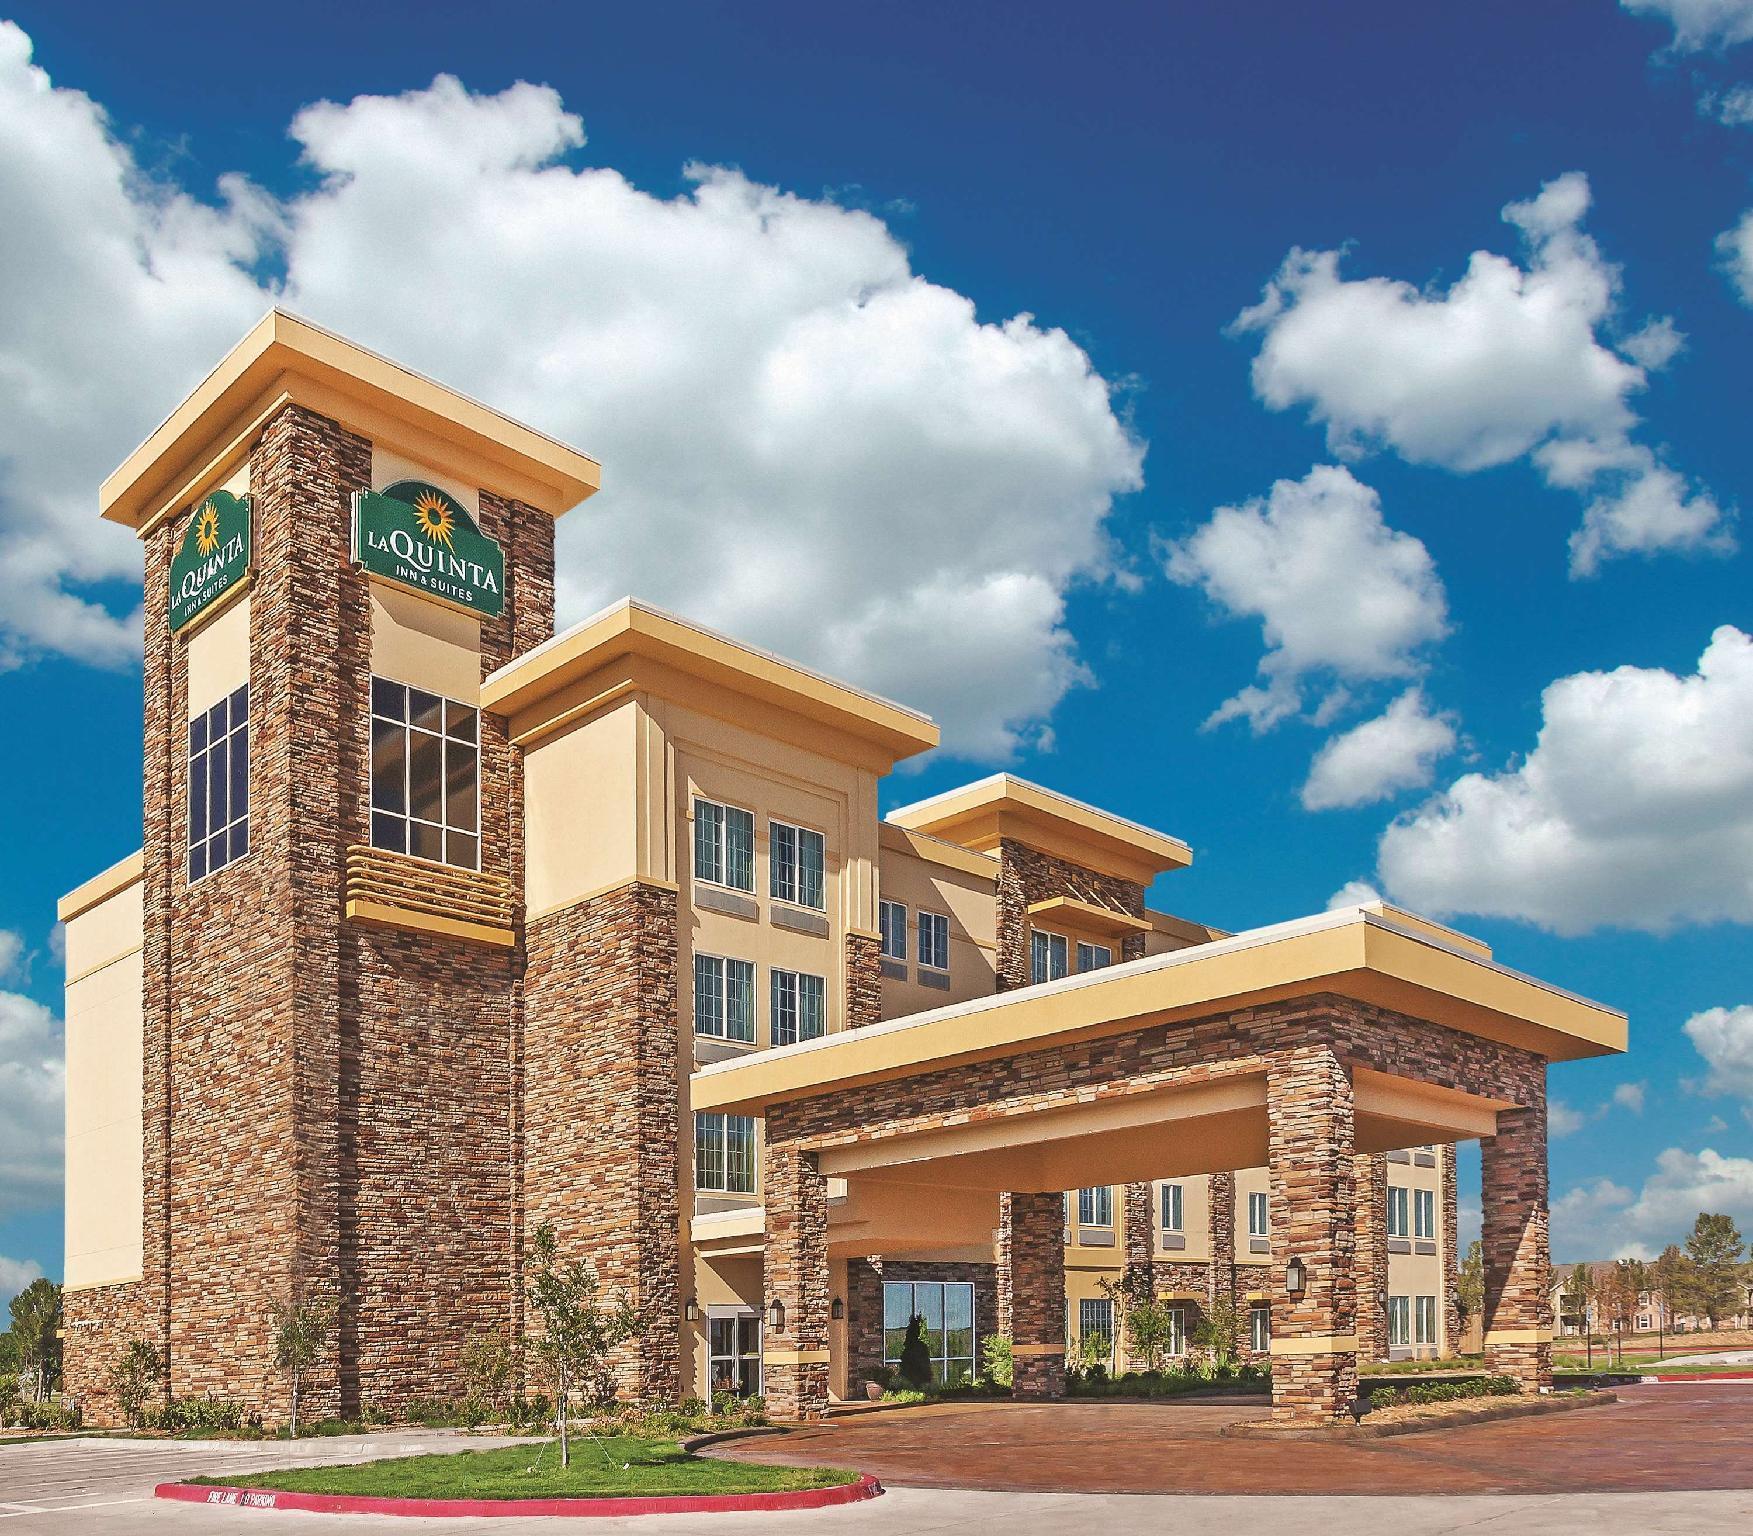 La Quinta Inn And Suites By Wyndham Pecos